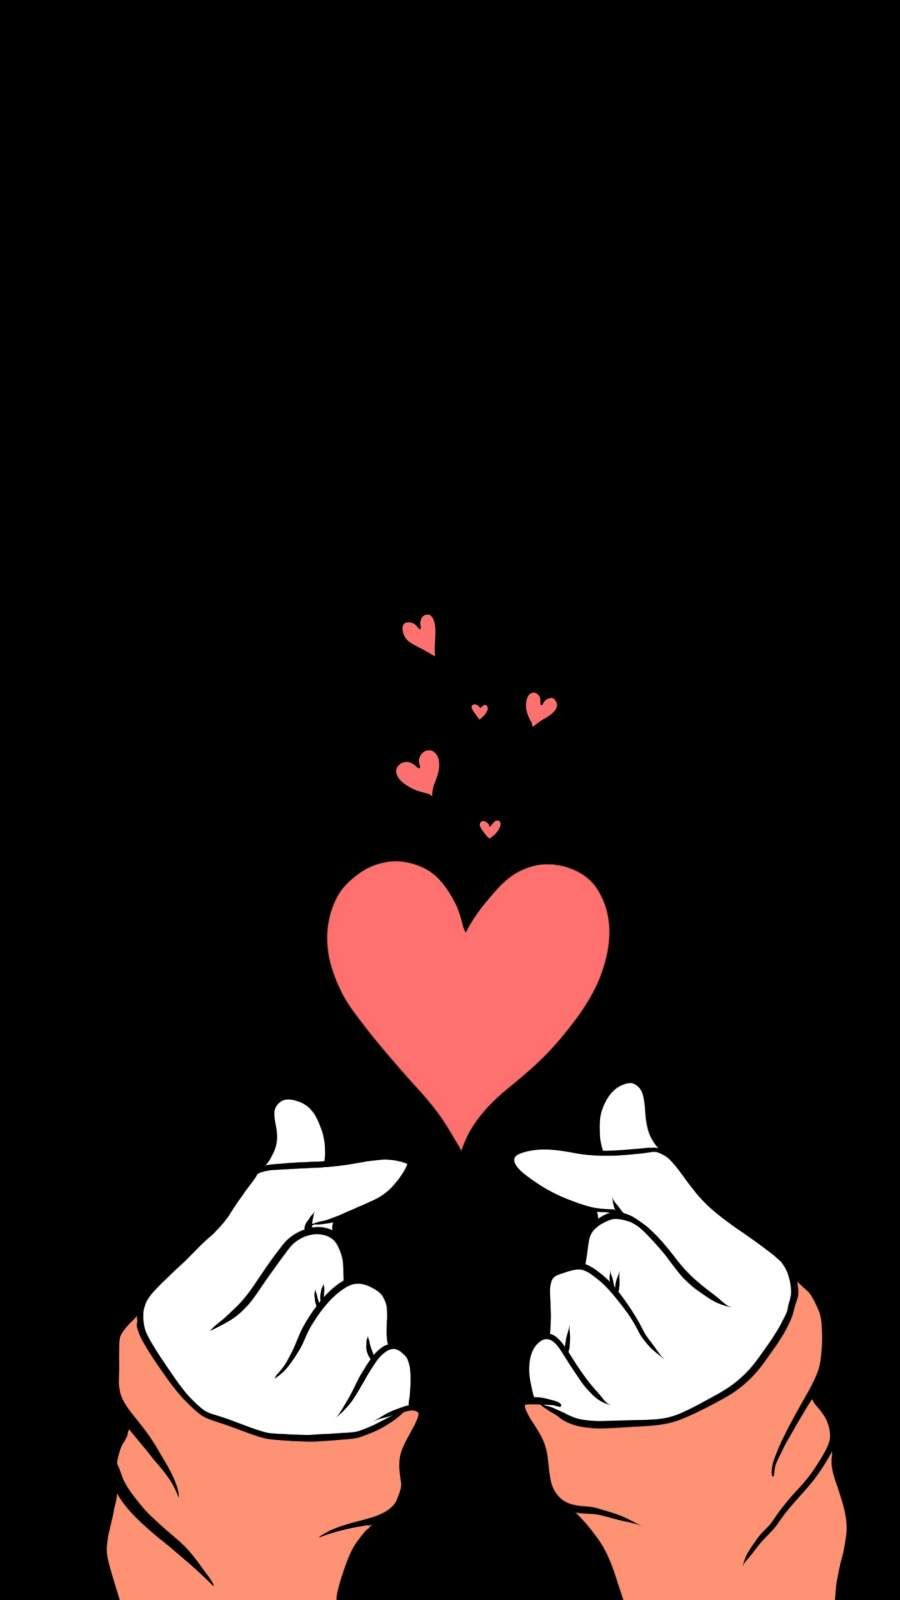 Love Heart Iphone Wallpaper Heart Iphone Wallpaper Iphone Wallpaper Iphone Wallpaper Tumblr Aesthetic